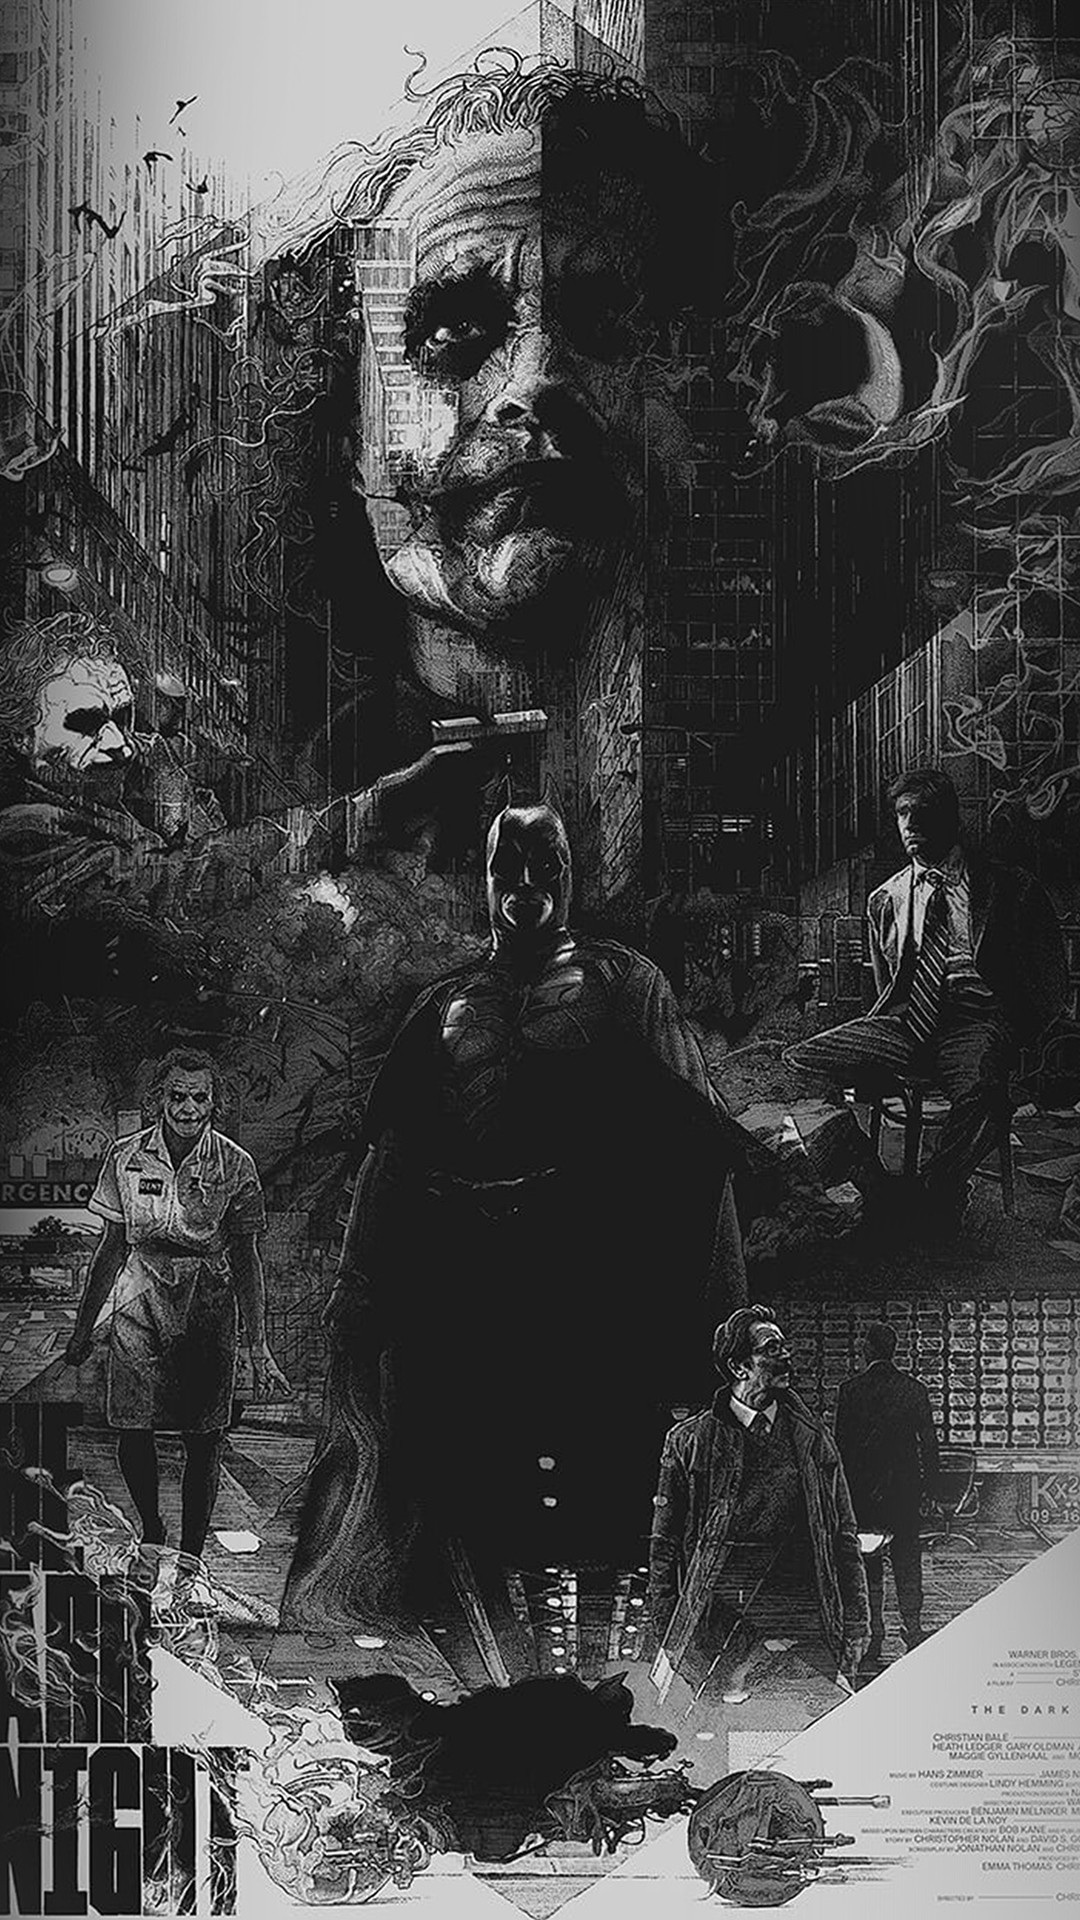 Joker Batman Poster Film Hero Illustration Art #iPhone #6 #wallpaper